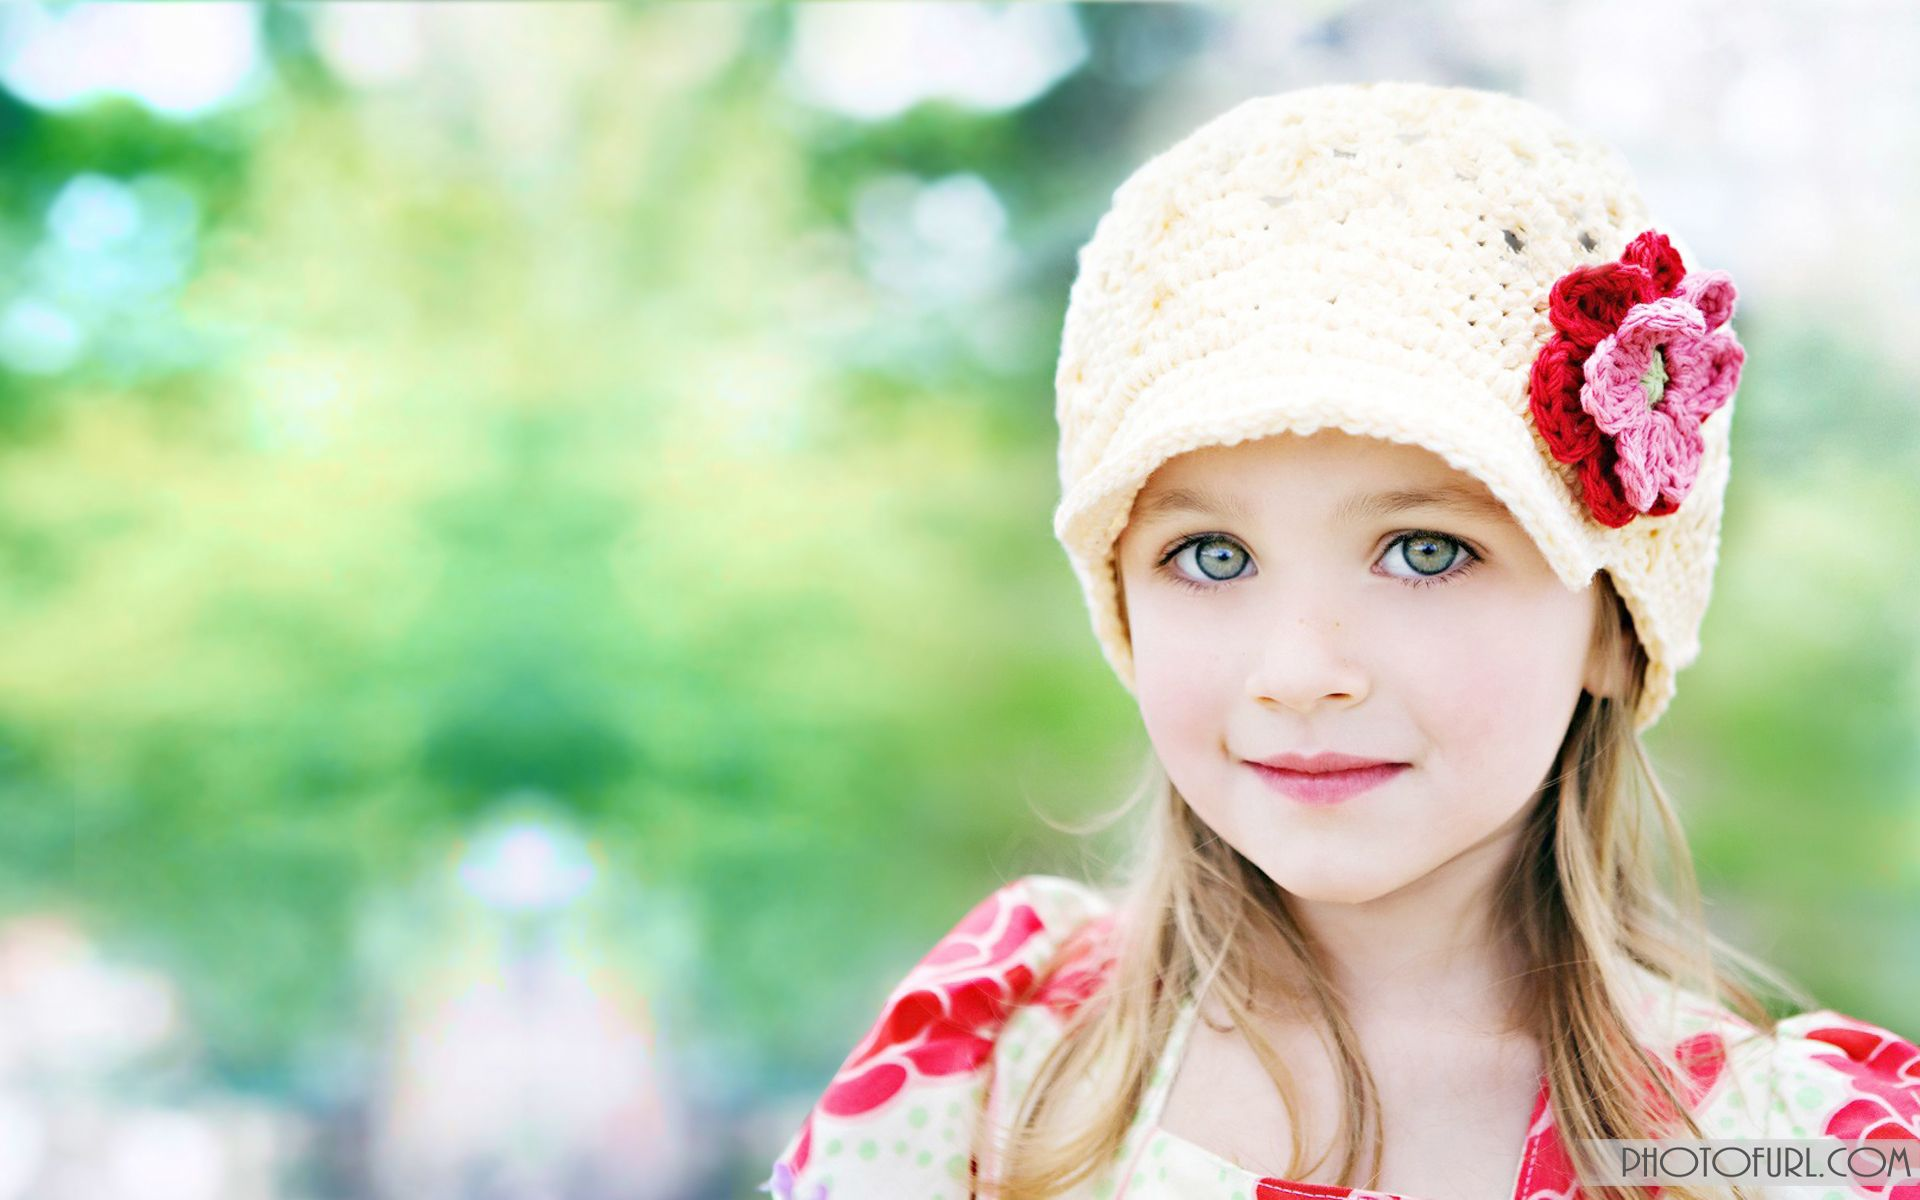 Wallpaper download baby girl - 17 Best Ideas About Cute Baby Girl Wallpaper On Pinterest Kelly Pu